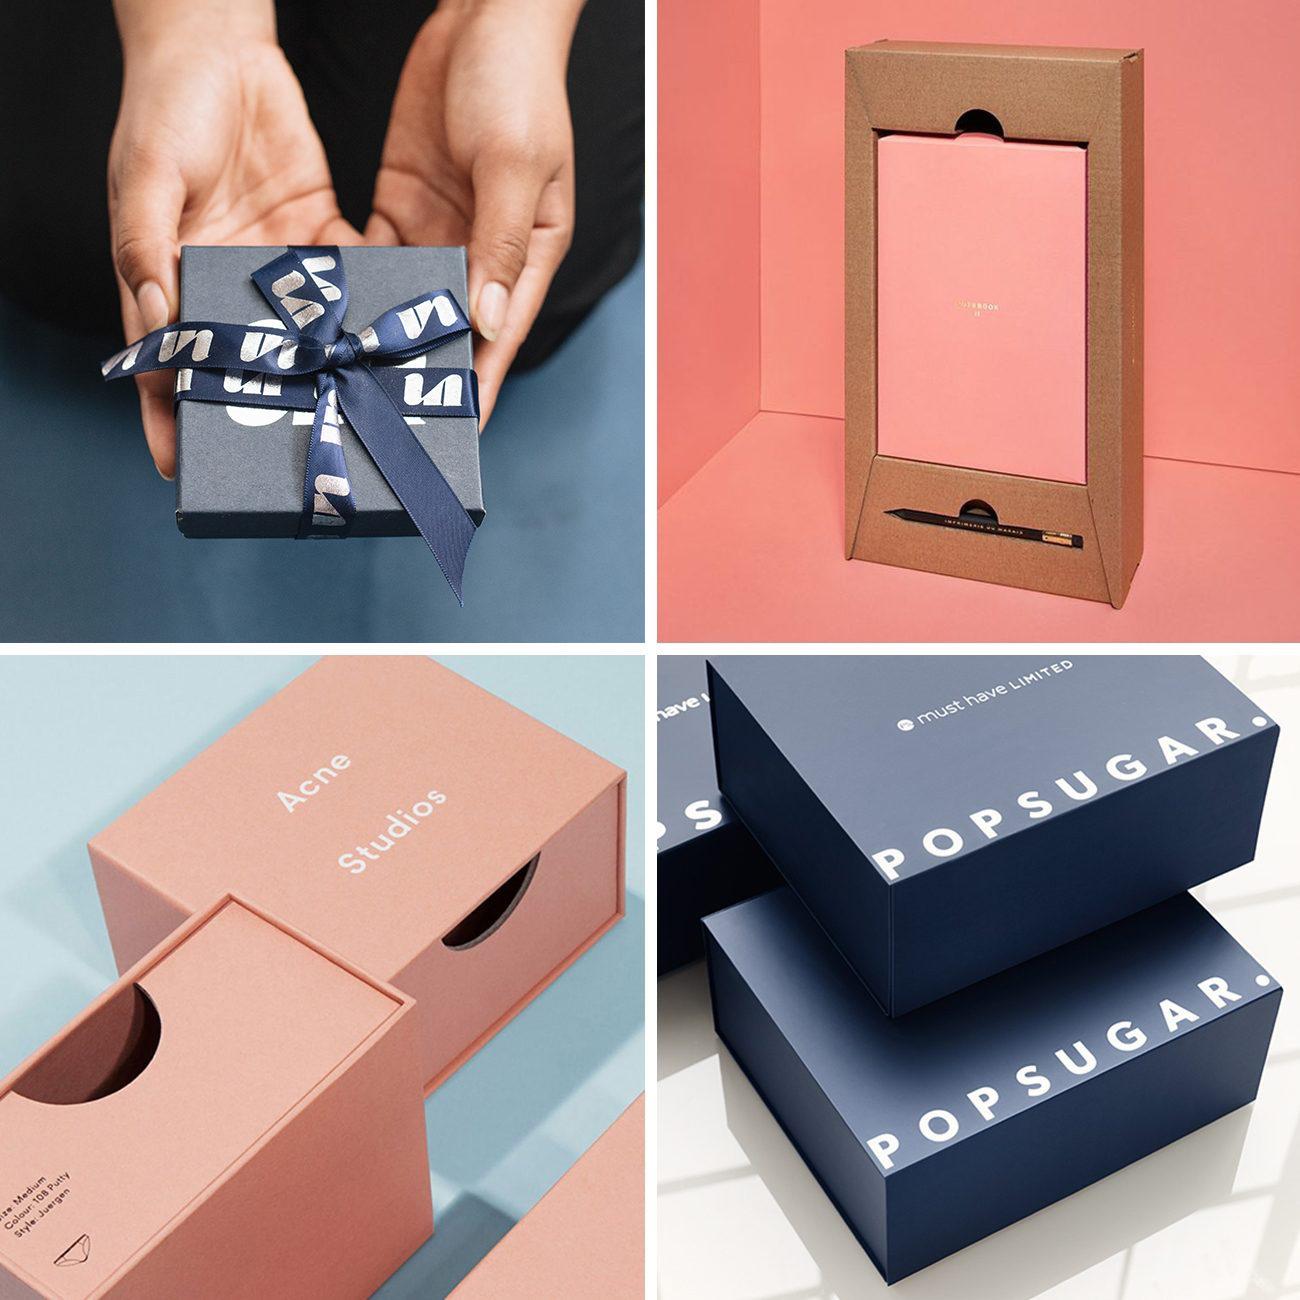 Photos via: Mary Rabun, Lumi, Acne Studios, Popsugar 70 Ideas to Spruce Up Your Holiday Packaging Design